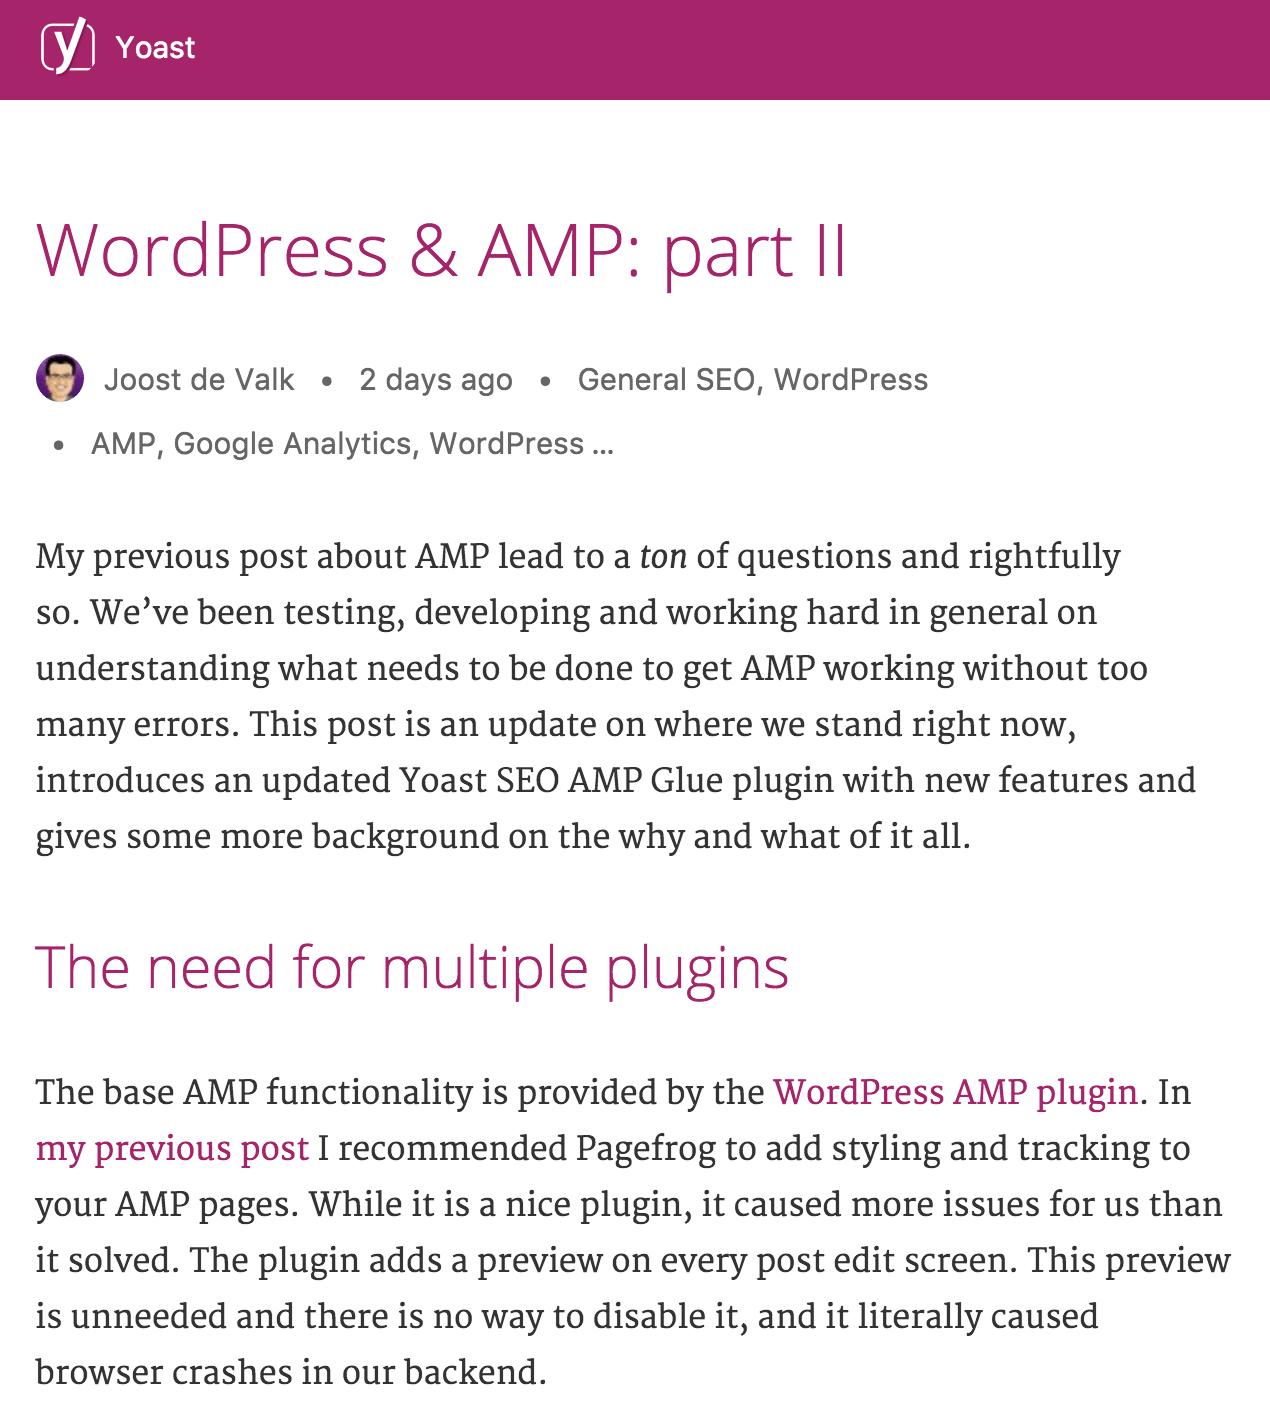 Download Glue for Yoast SEO & AMP 0.4.3 – Free WordPress Plugin